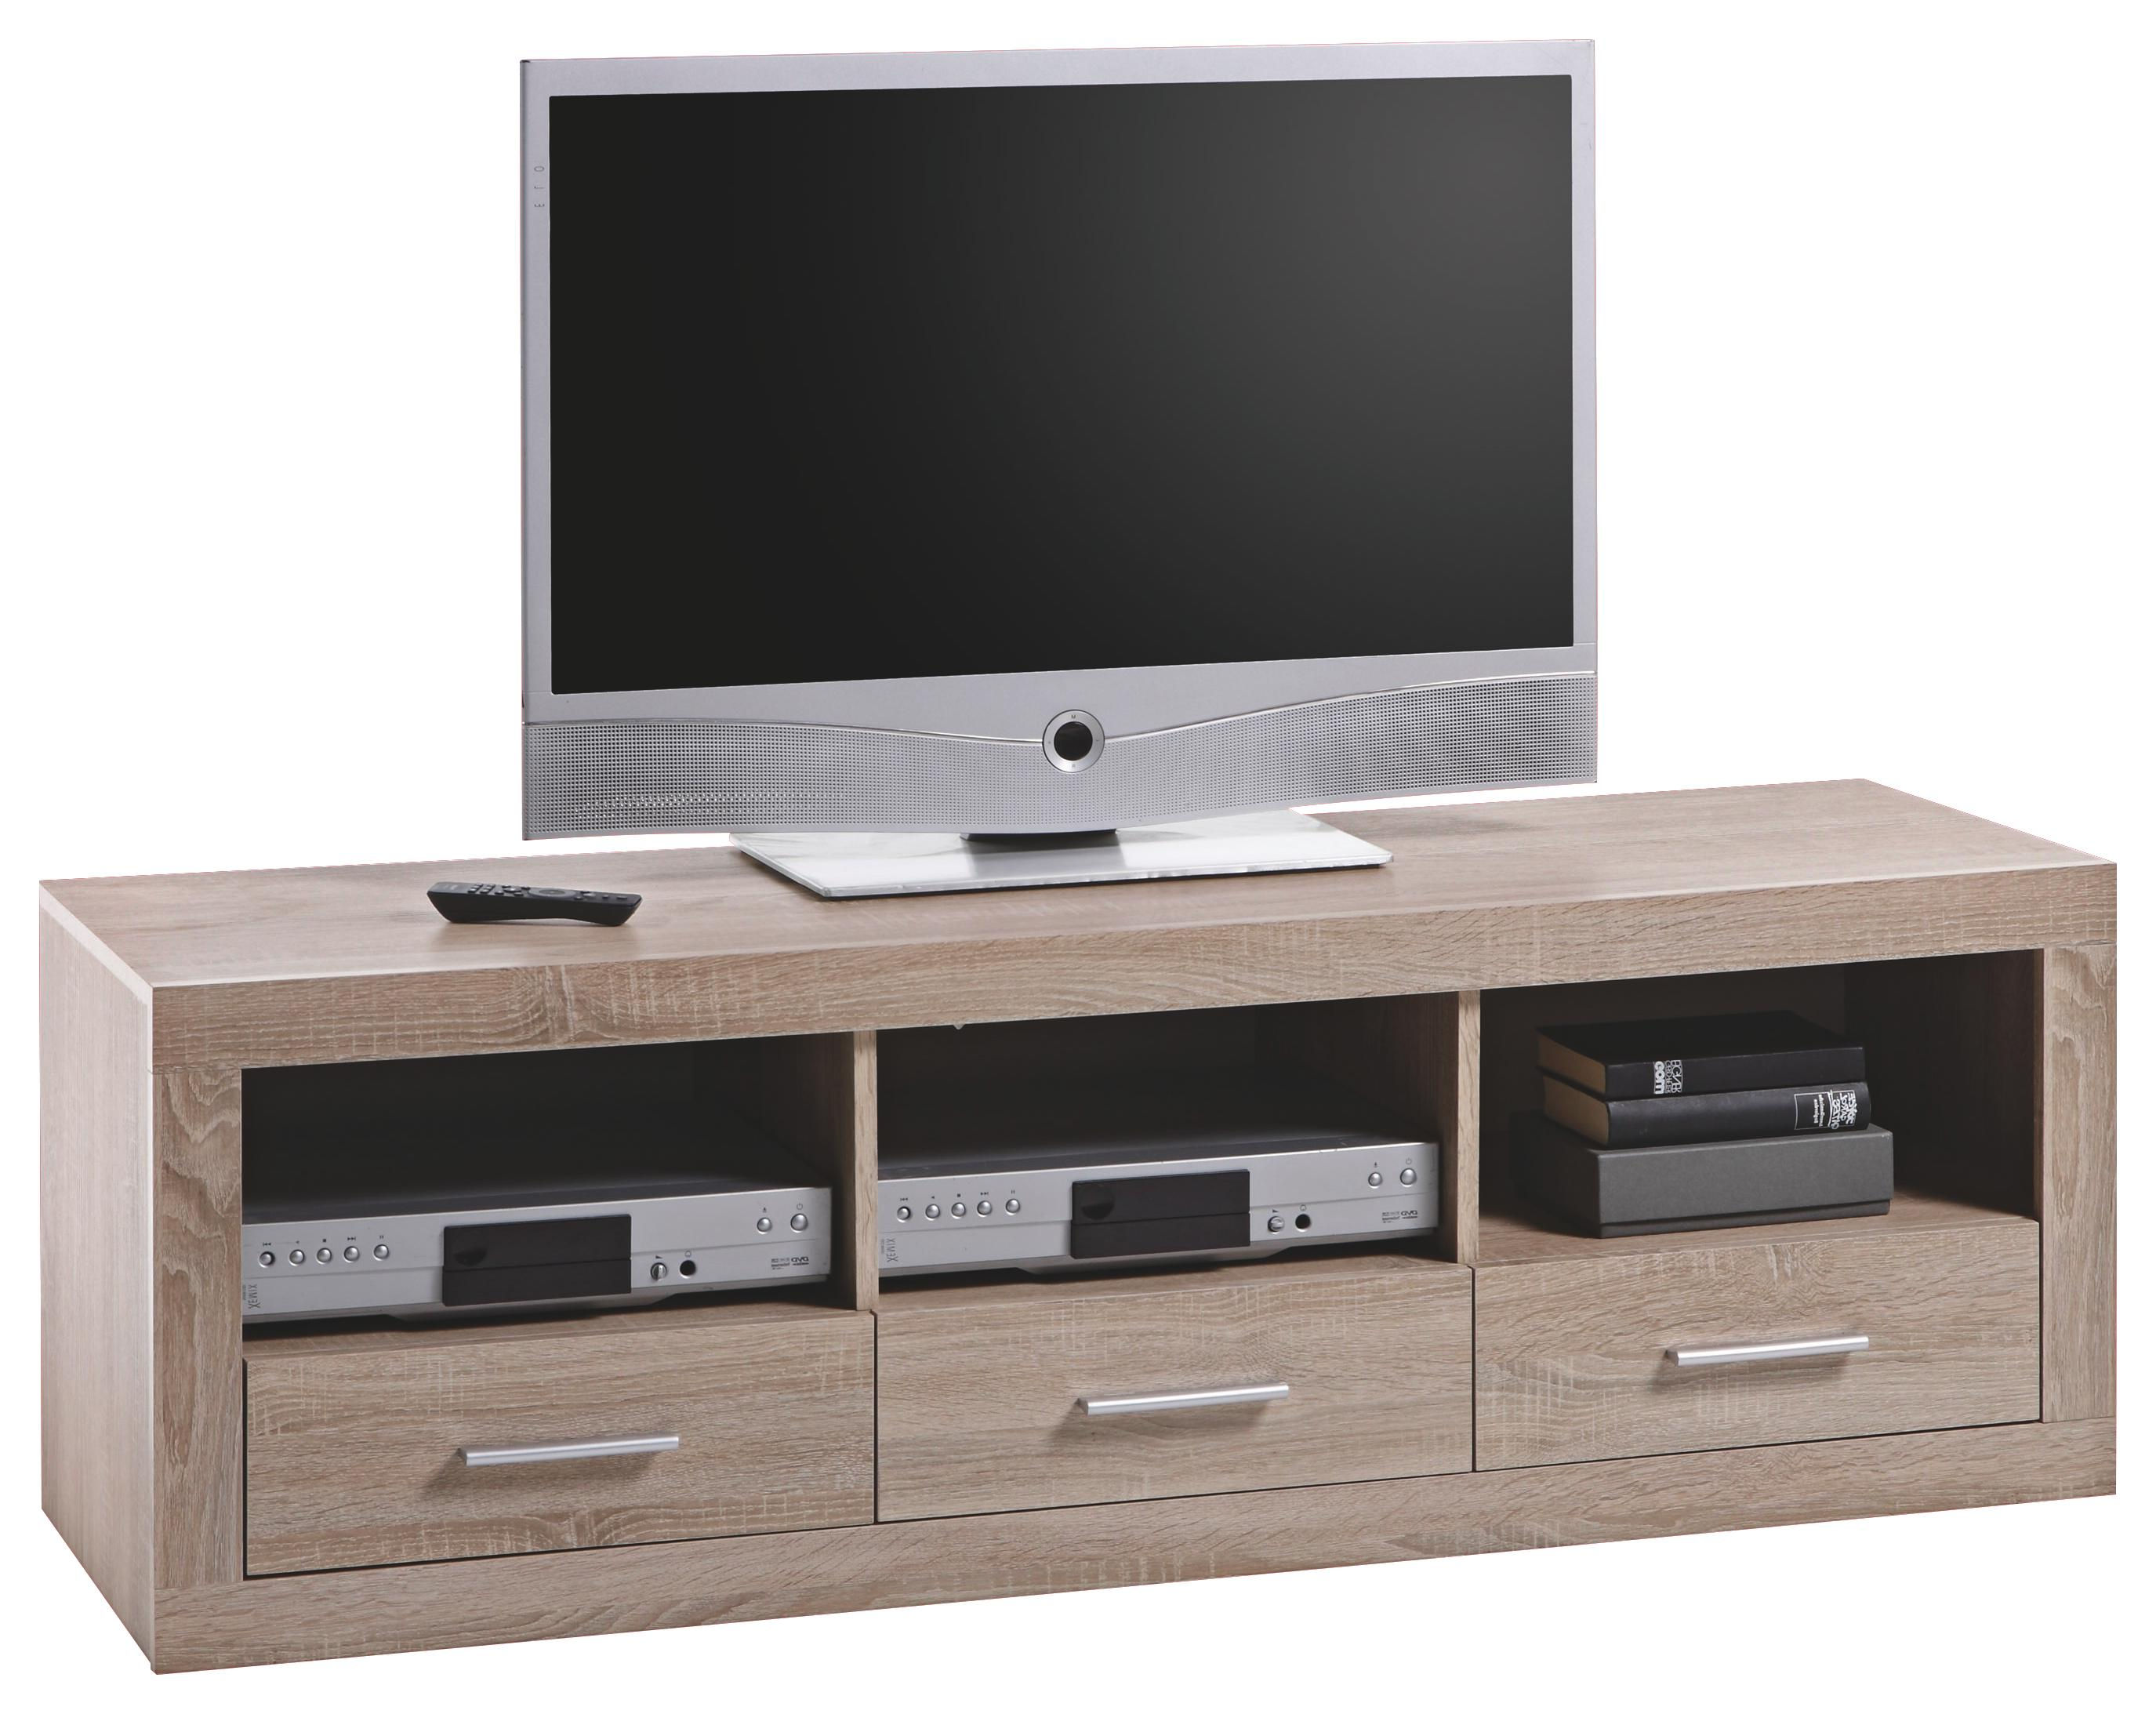 TV ELEMENT - boje hrasta/boje srebra, Design, drvni materijal/drvo (147 49 45cm) - Boxxx